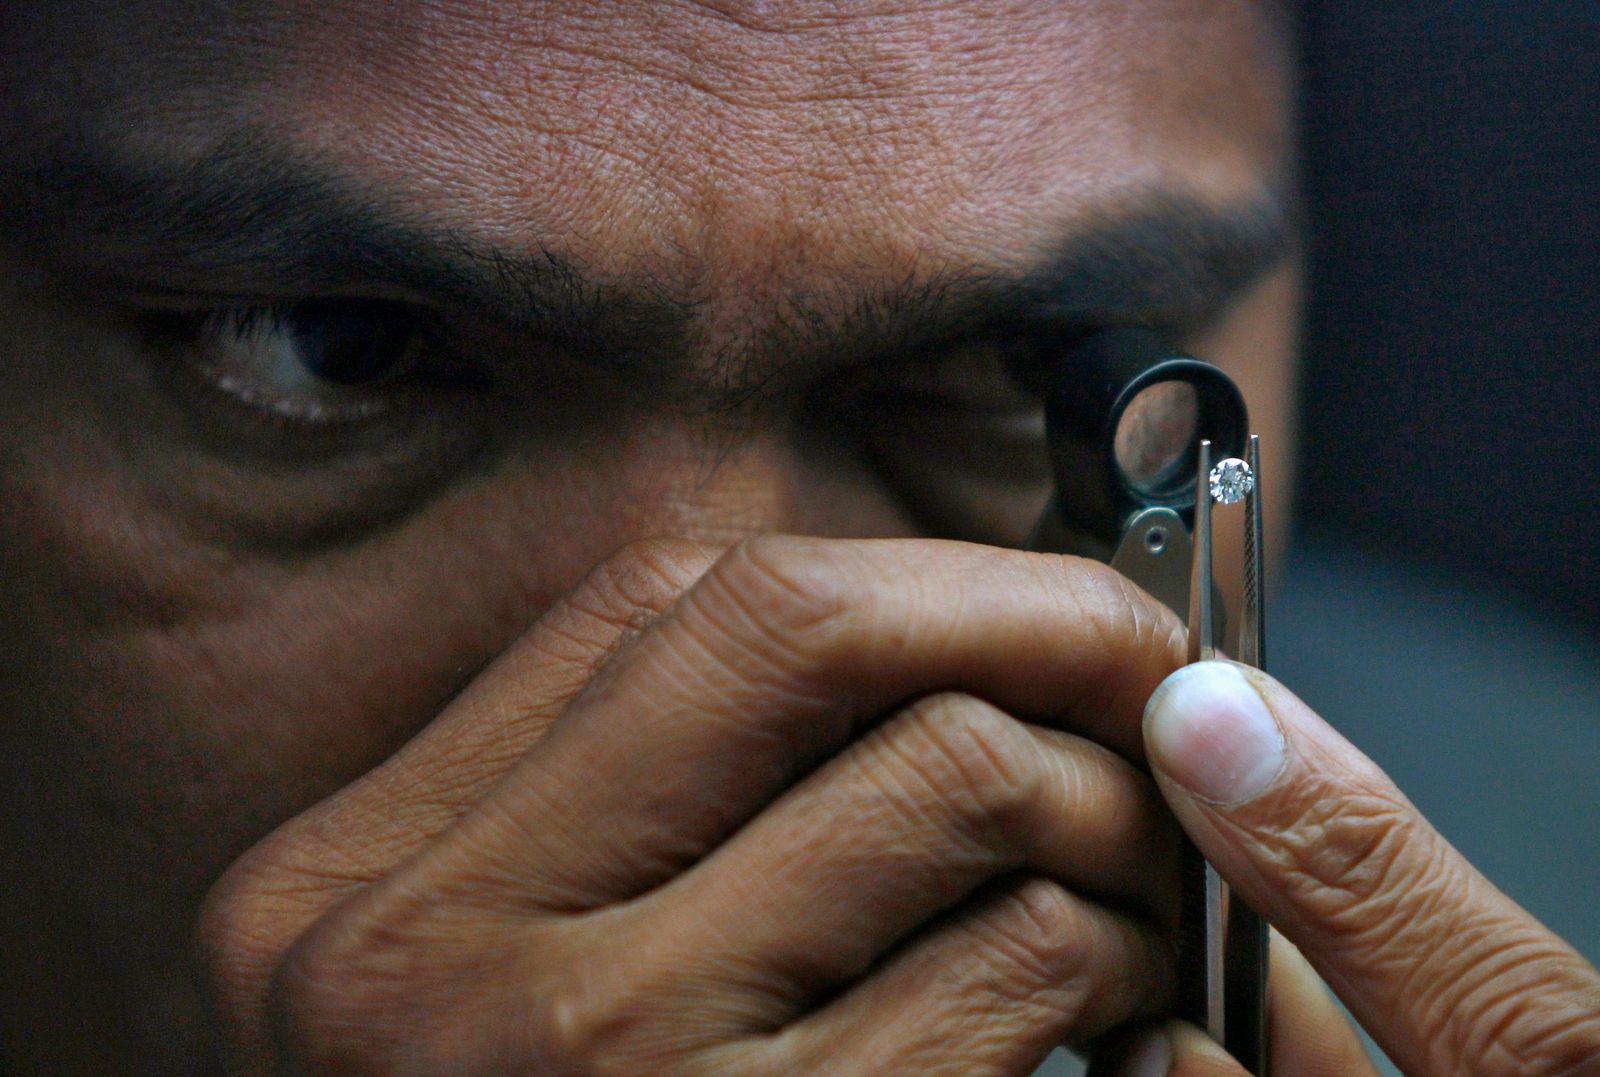 Indien; Diamantenhändler; Lupe